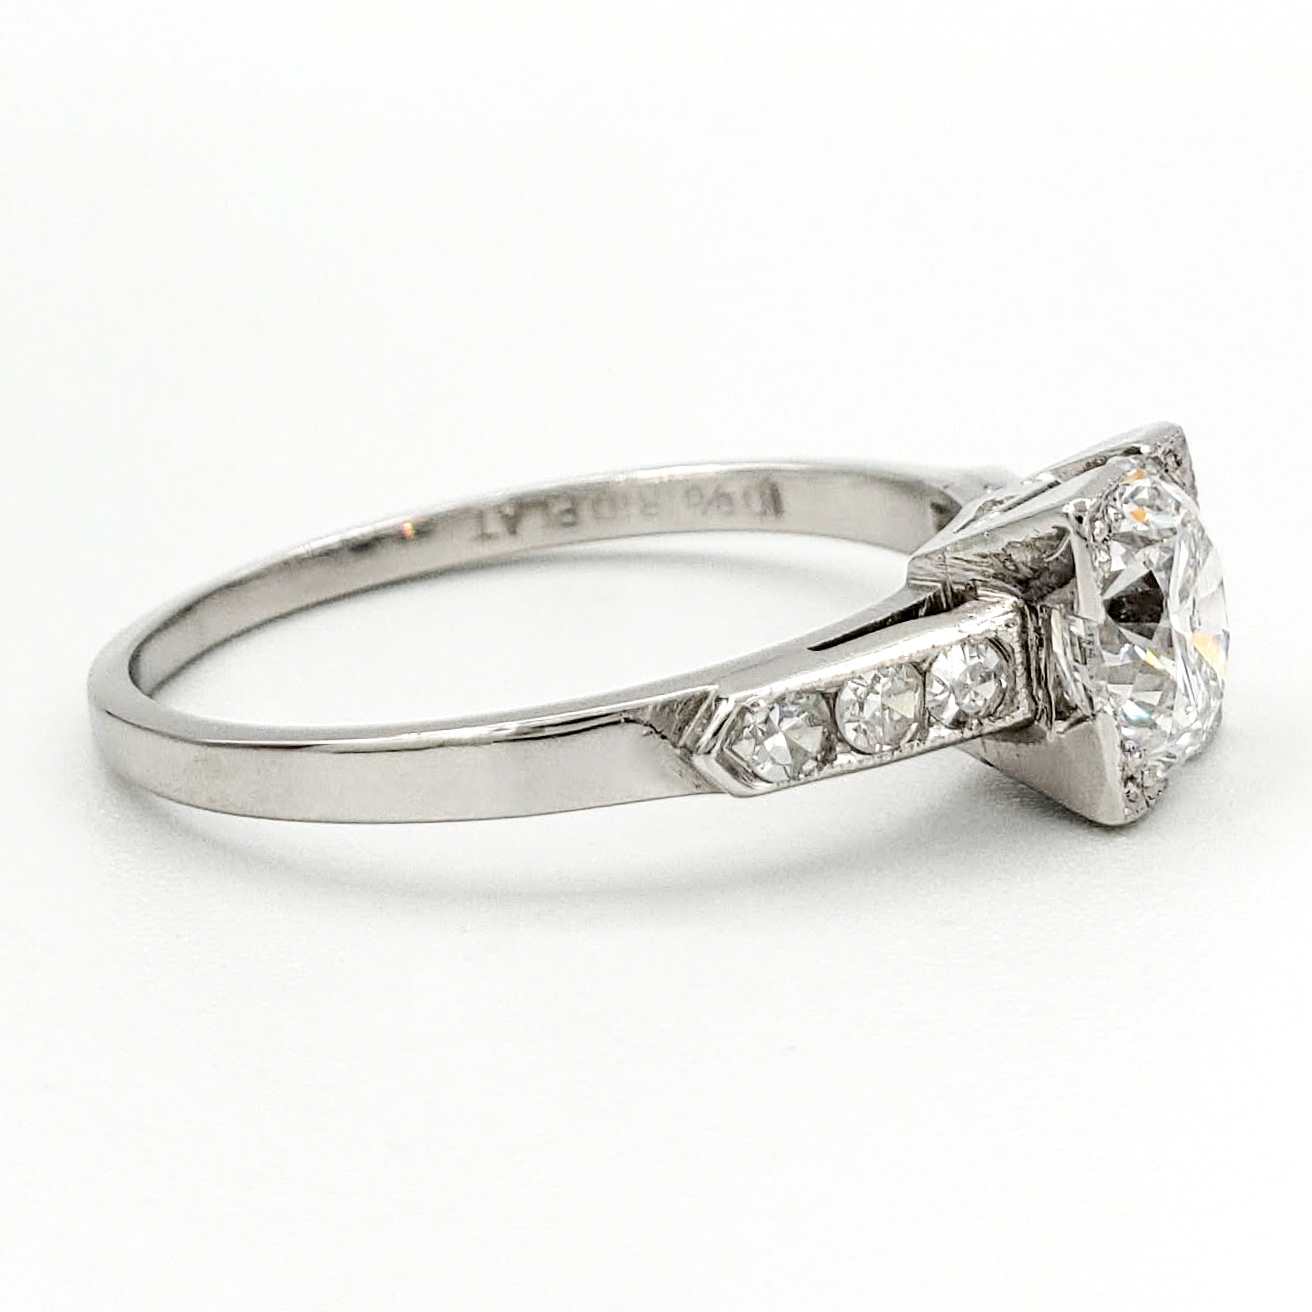 vintage-platinum-engagement-ring-with-1-02-carat-round-brilliant-cut-diamond-egl-d-si2